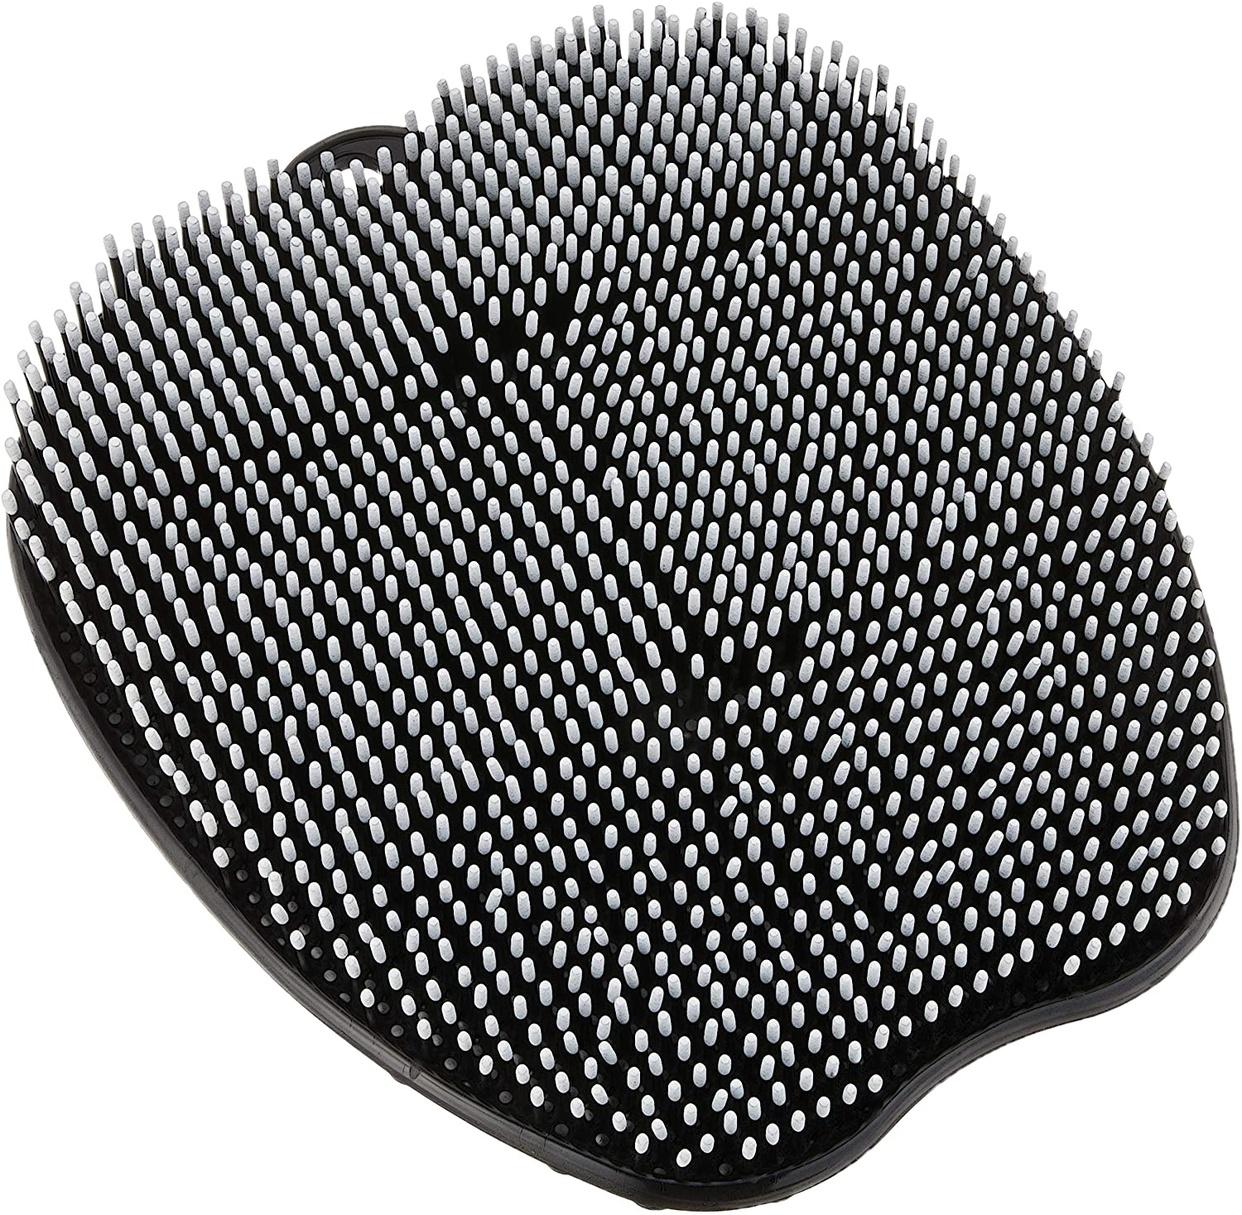 Sunpac(サンパック) フットグルーマーグランスポーツの商品画像